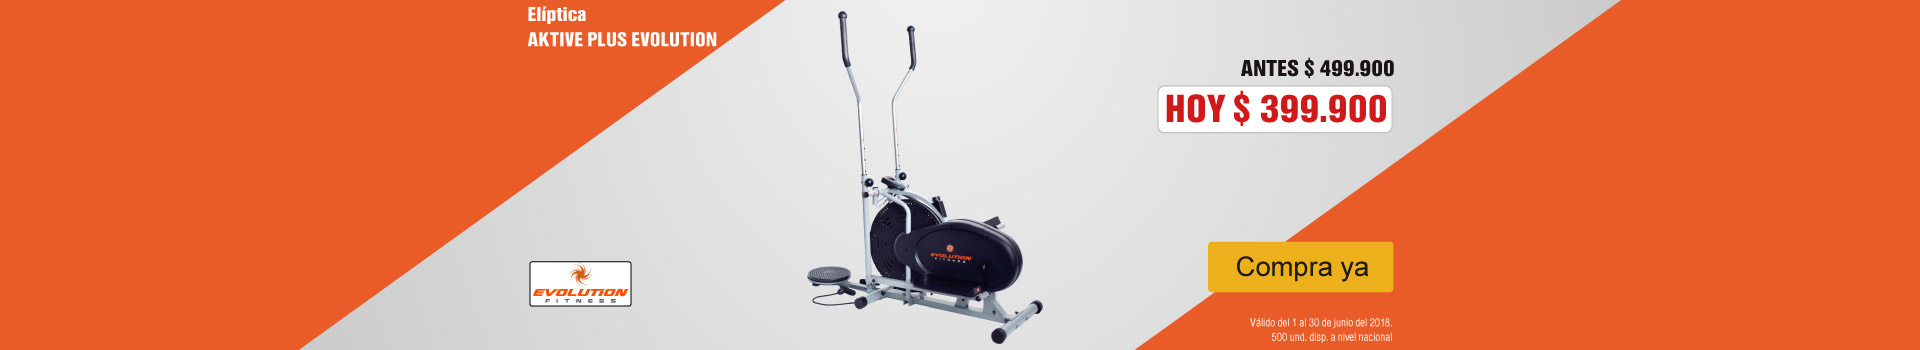 AK-KT-BCAT-6-Deportes-PP-Evolution-ElipticaAktivePlus-Jun23